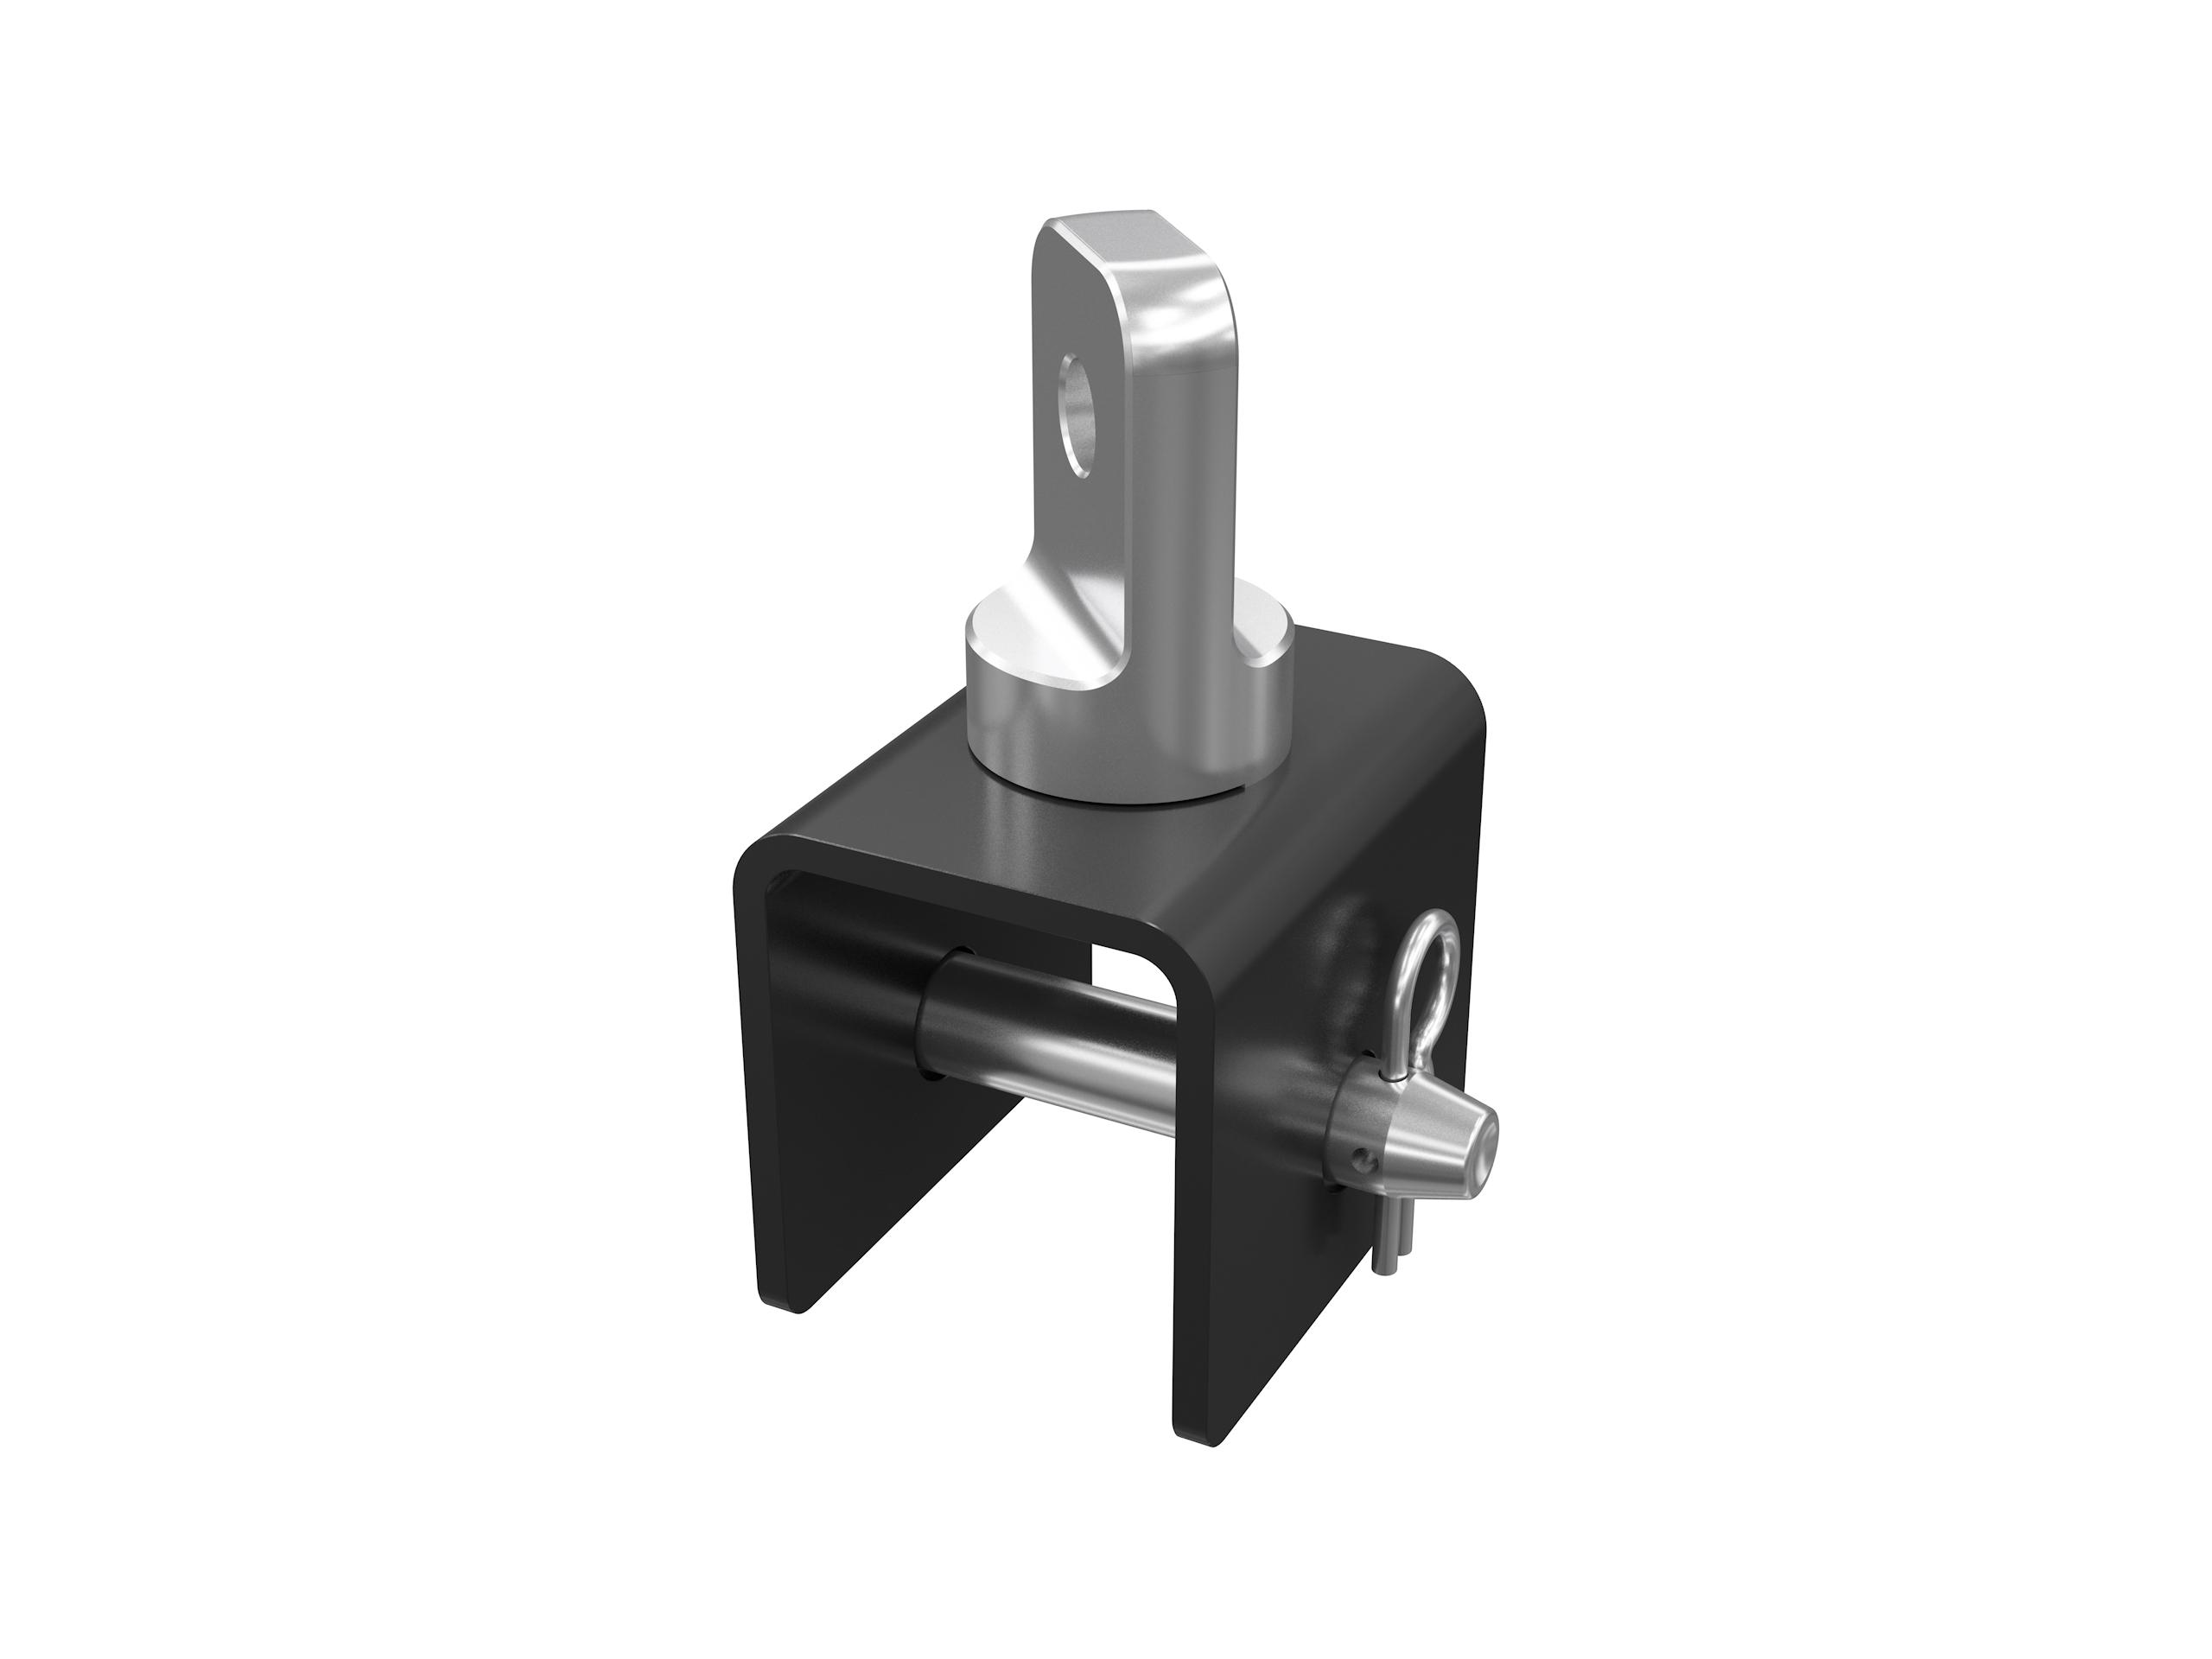 MTB Gabelkopf Abgang Version 2 inkl. 1xPIN20 & 4mm R-Clip